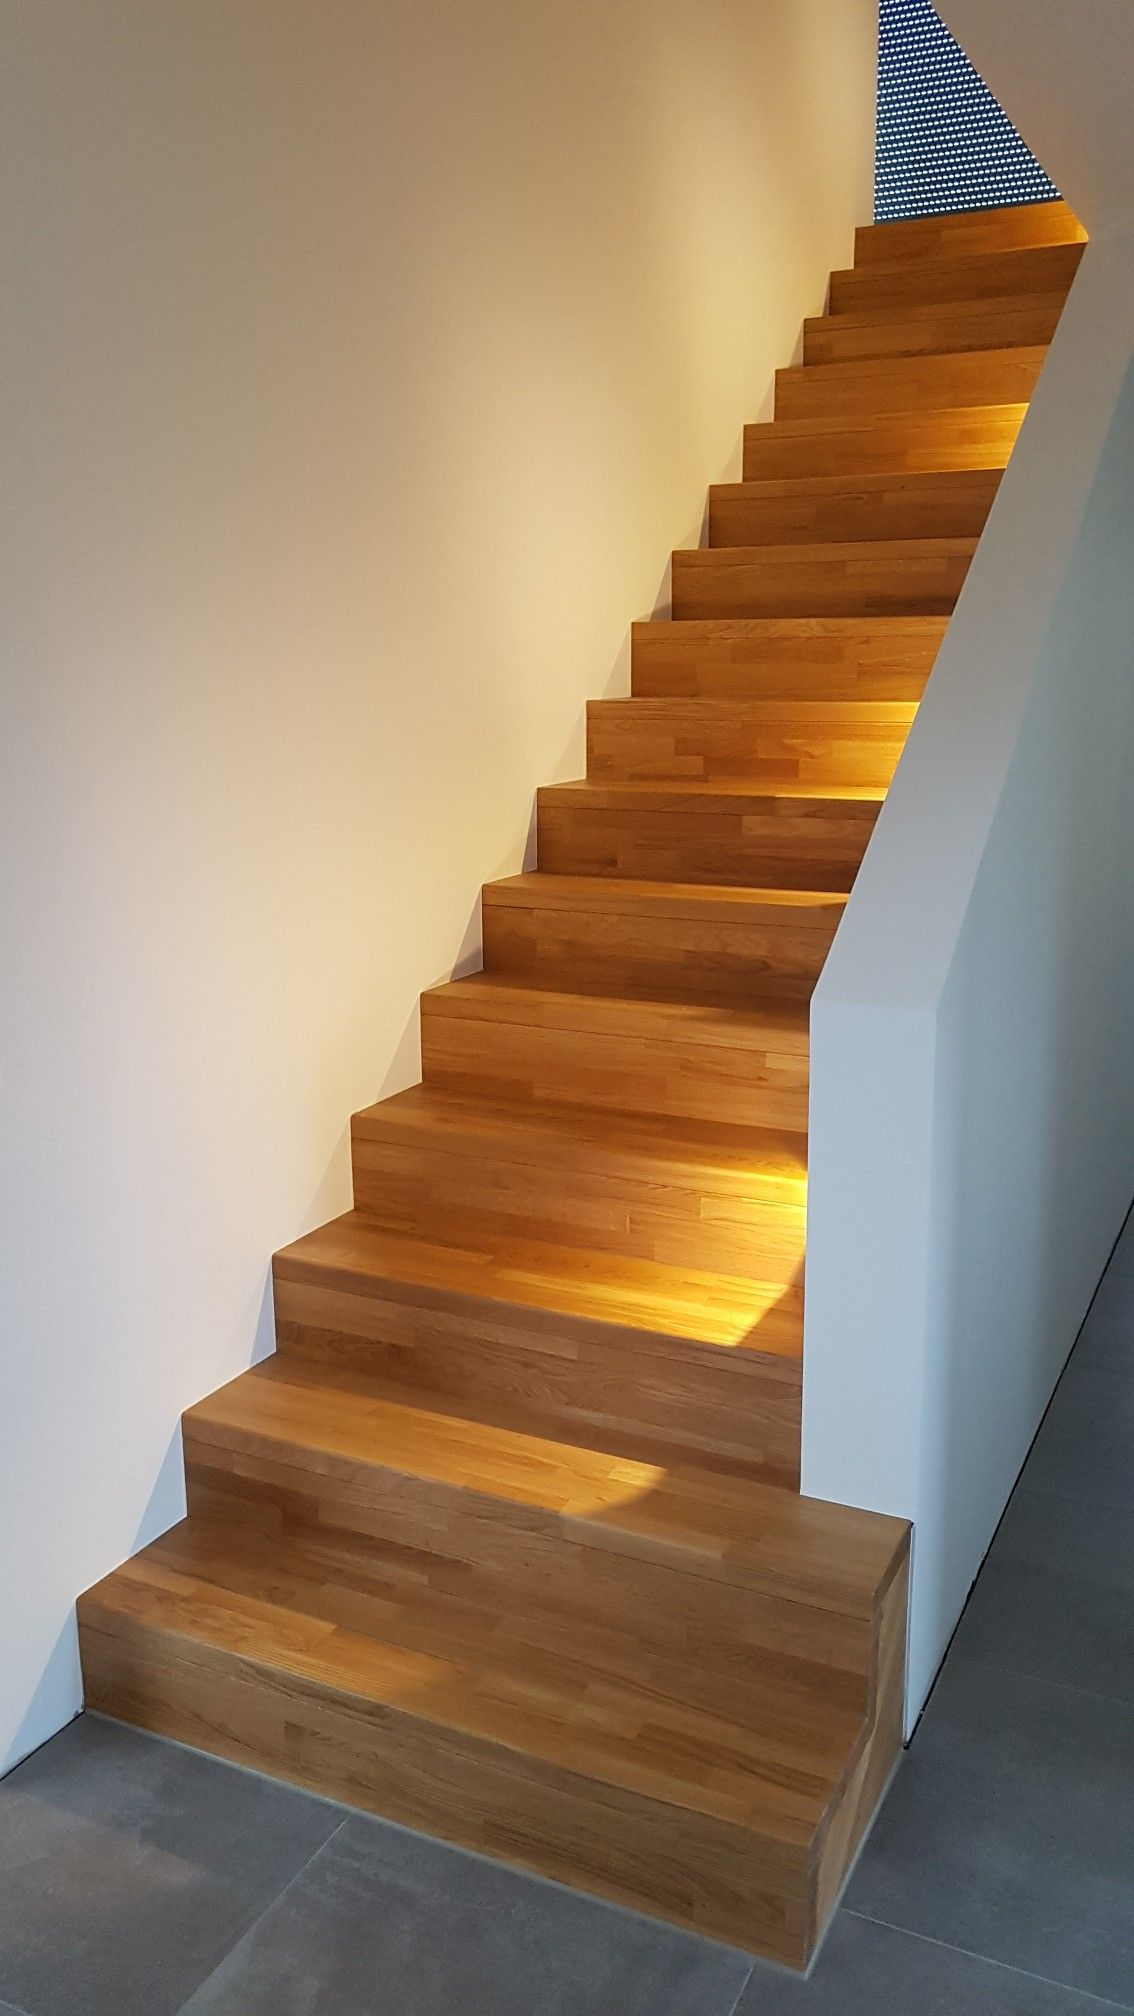 gerade treppe beleuchtung eiche eigenheim pinterest eiche beleuchtung und treppe. Black Bedroom Furniture Sets. Home Design Ideas